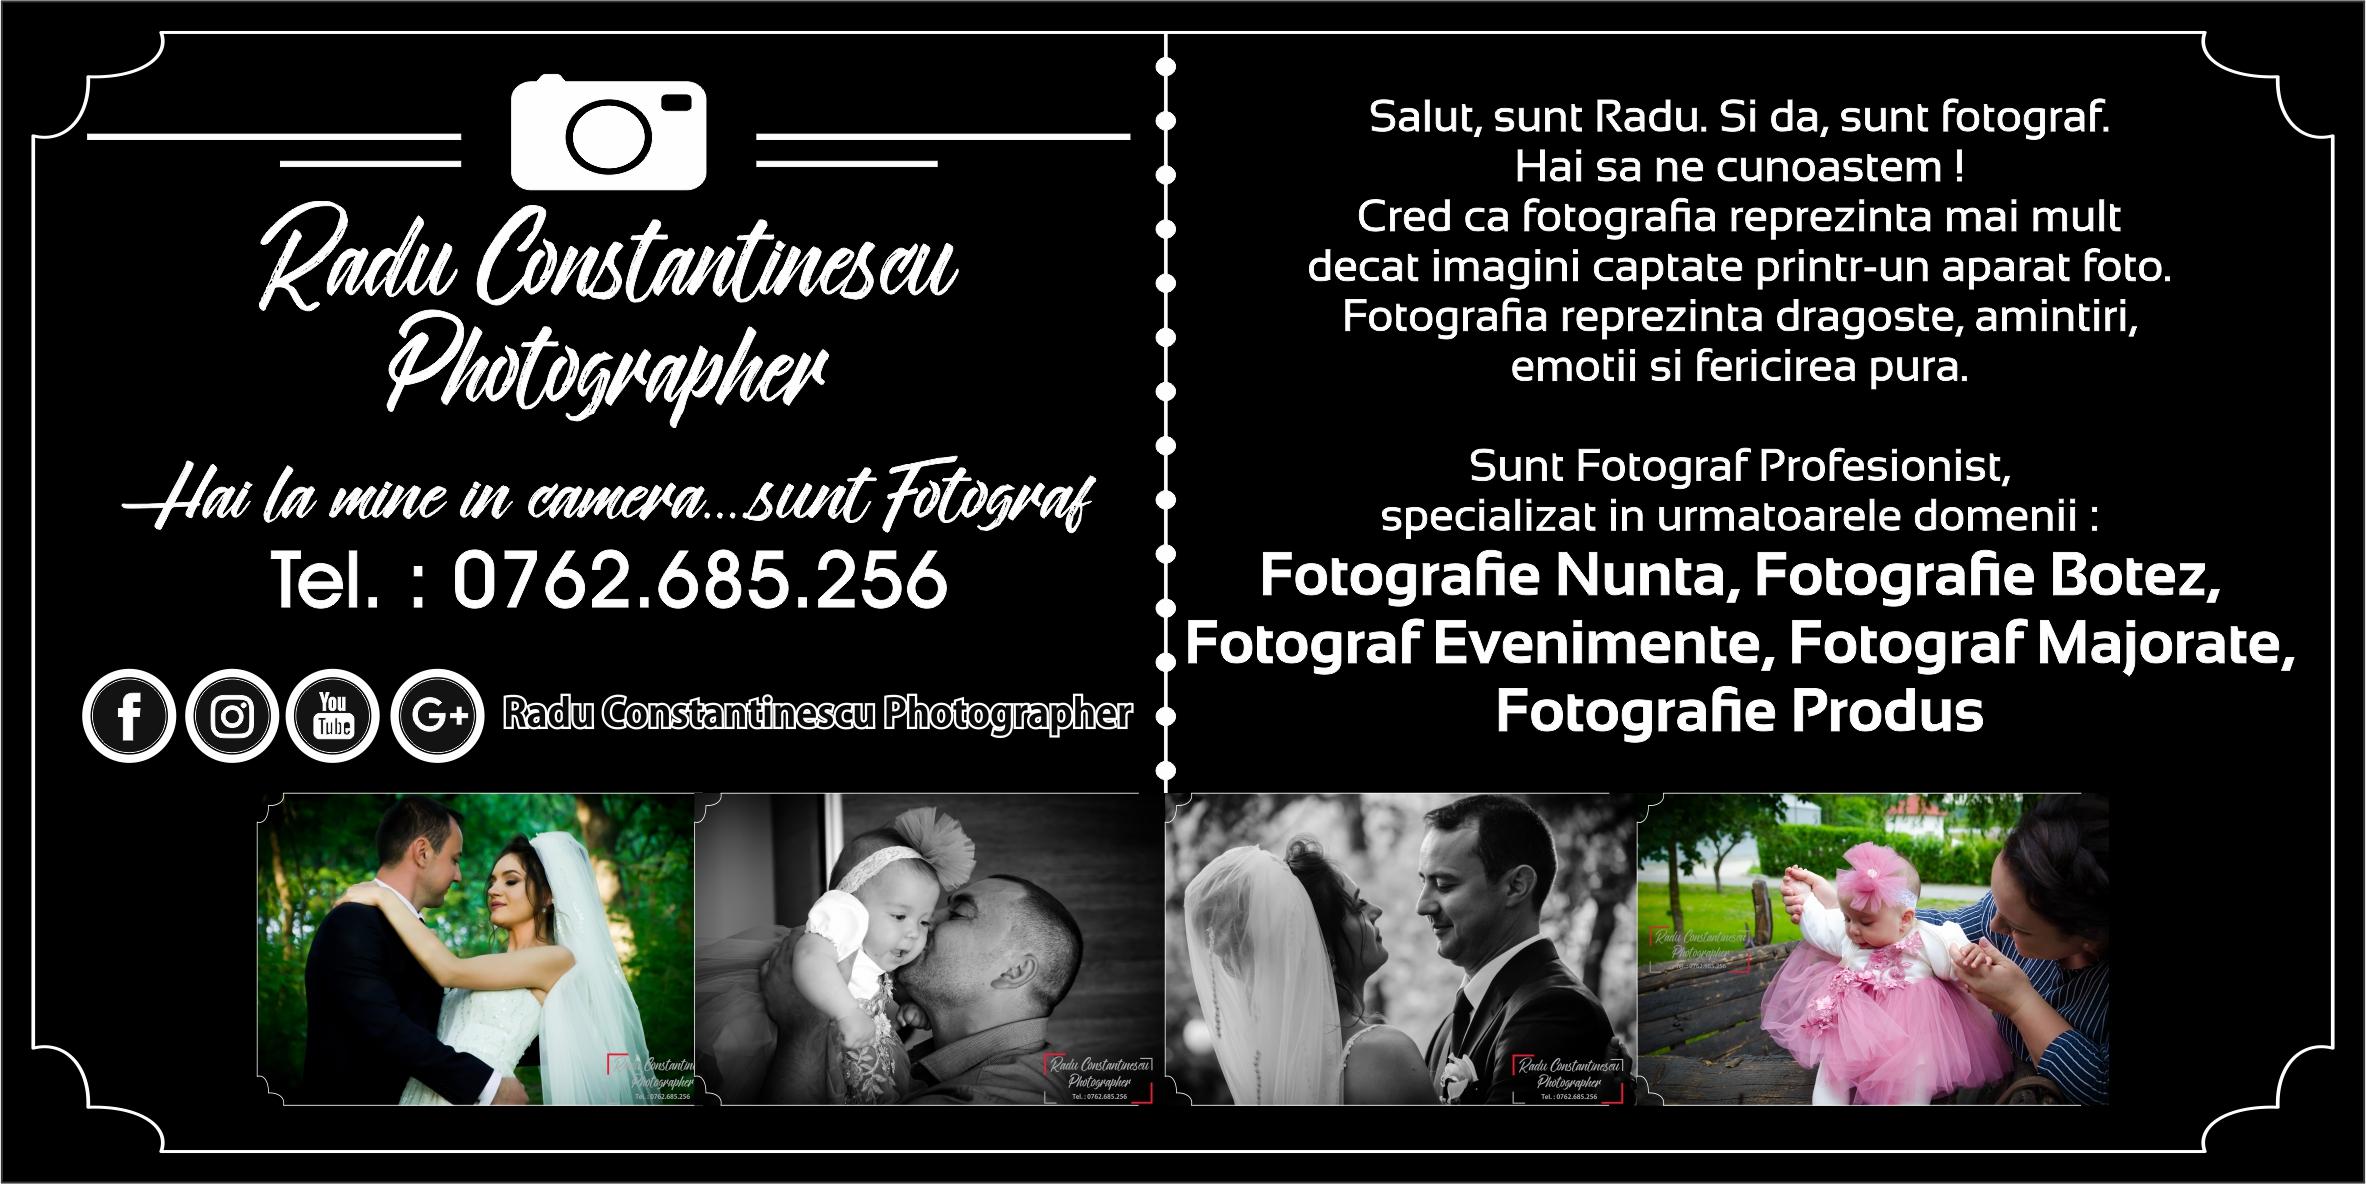 Oferta Fotograf Nunta, Botez, Majorate, Evenimente Craiova, Slatina, Caracal, Calafat, Severin, Taragu Jiu, Bals